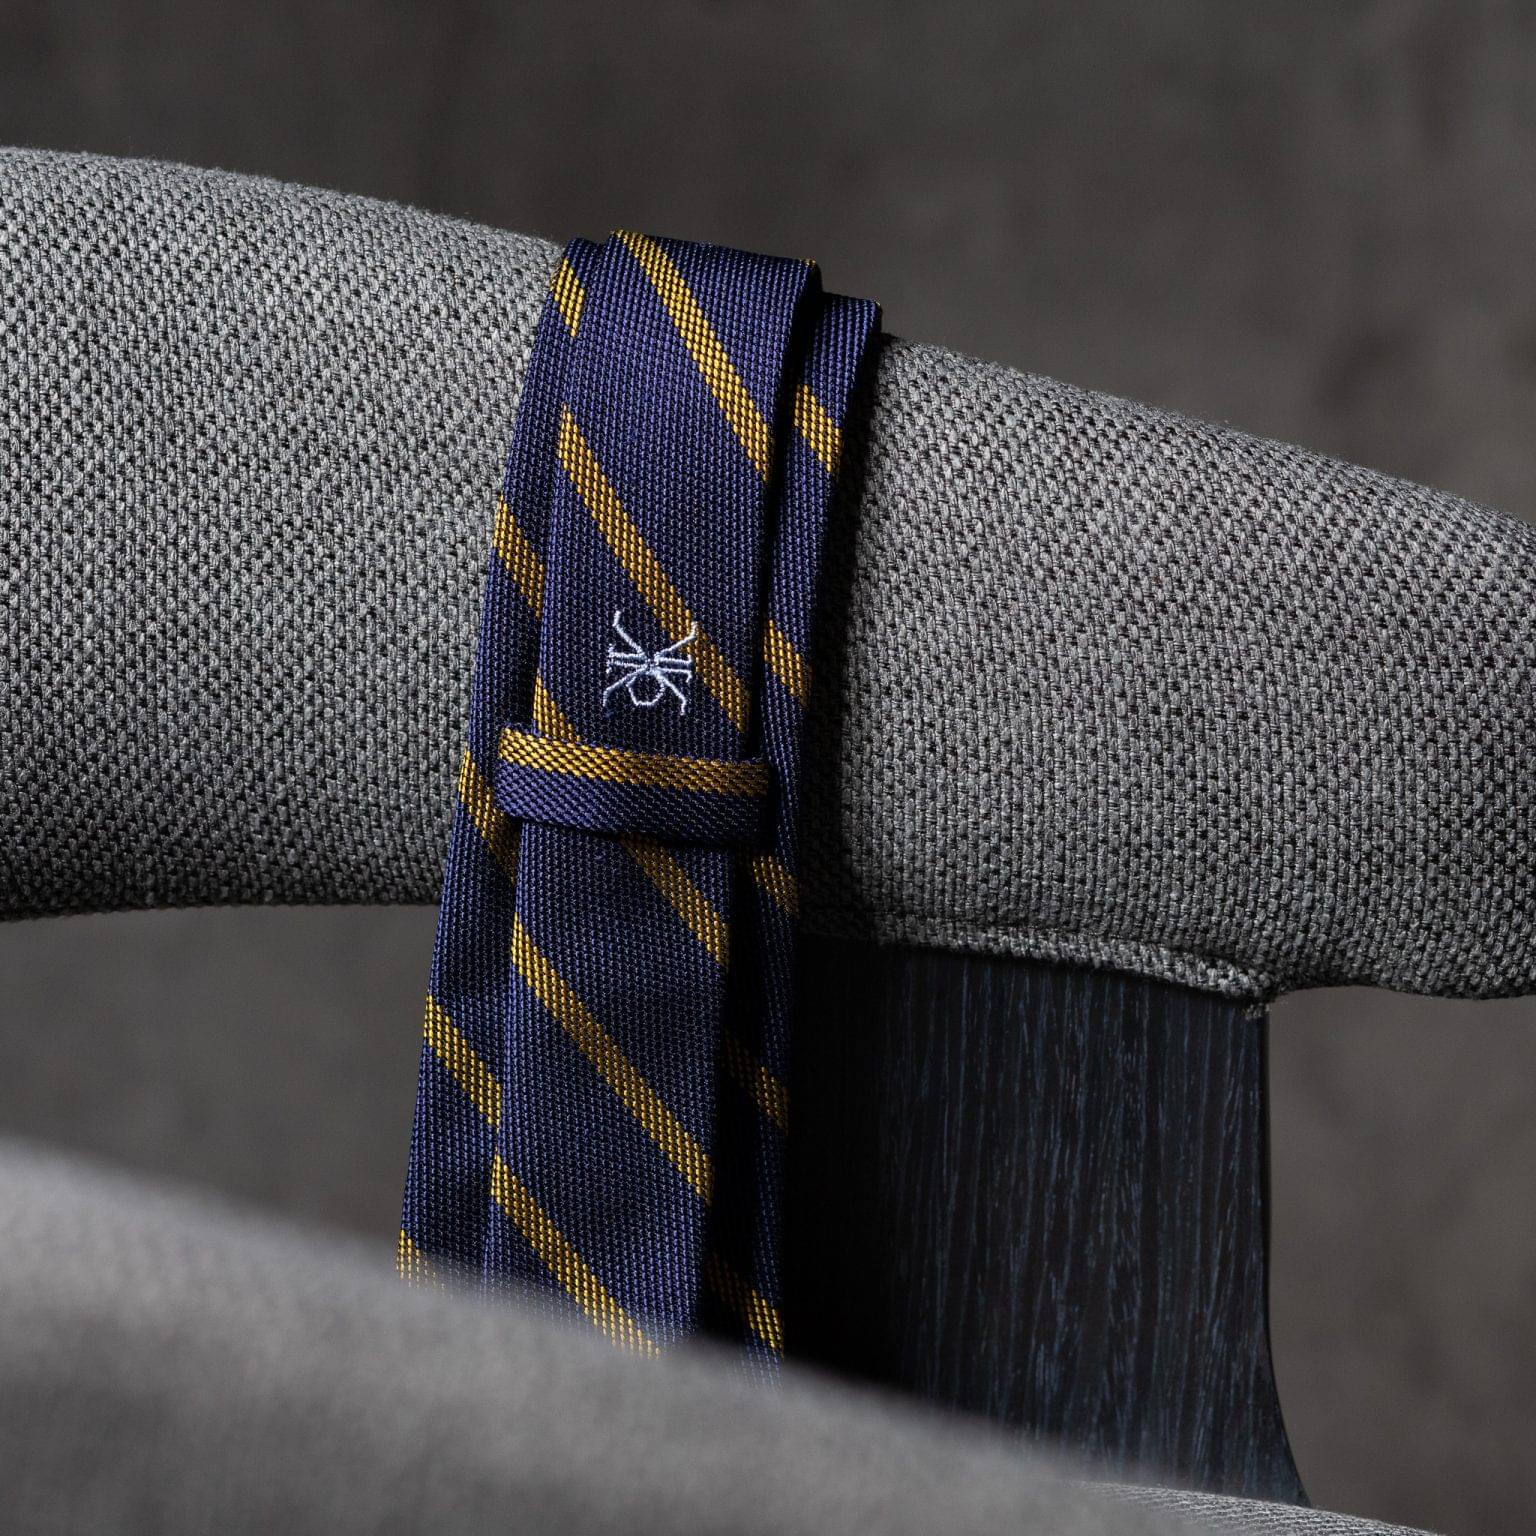 GRENADINE-0444-Tie-Initials-Corbata-Iniciales-The-Seelk-4